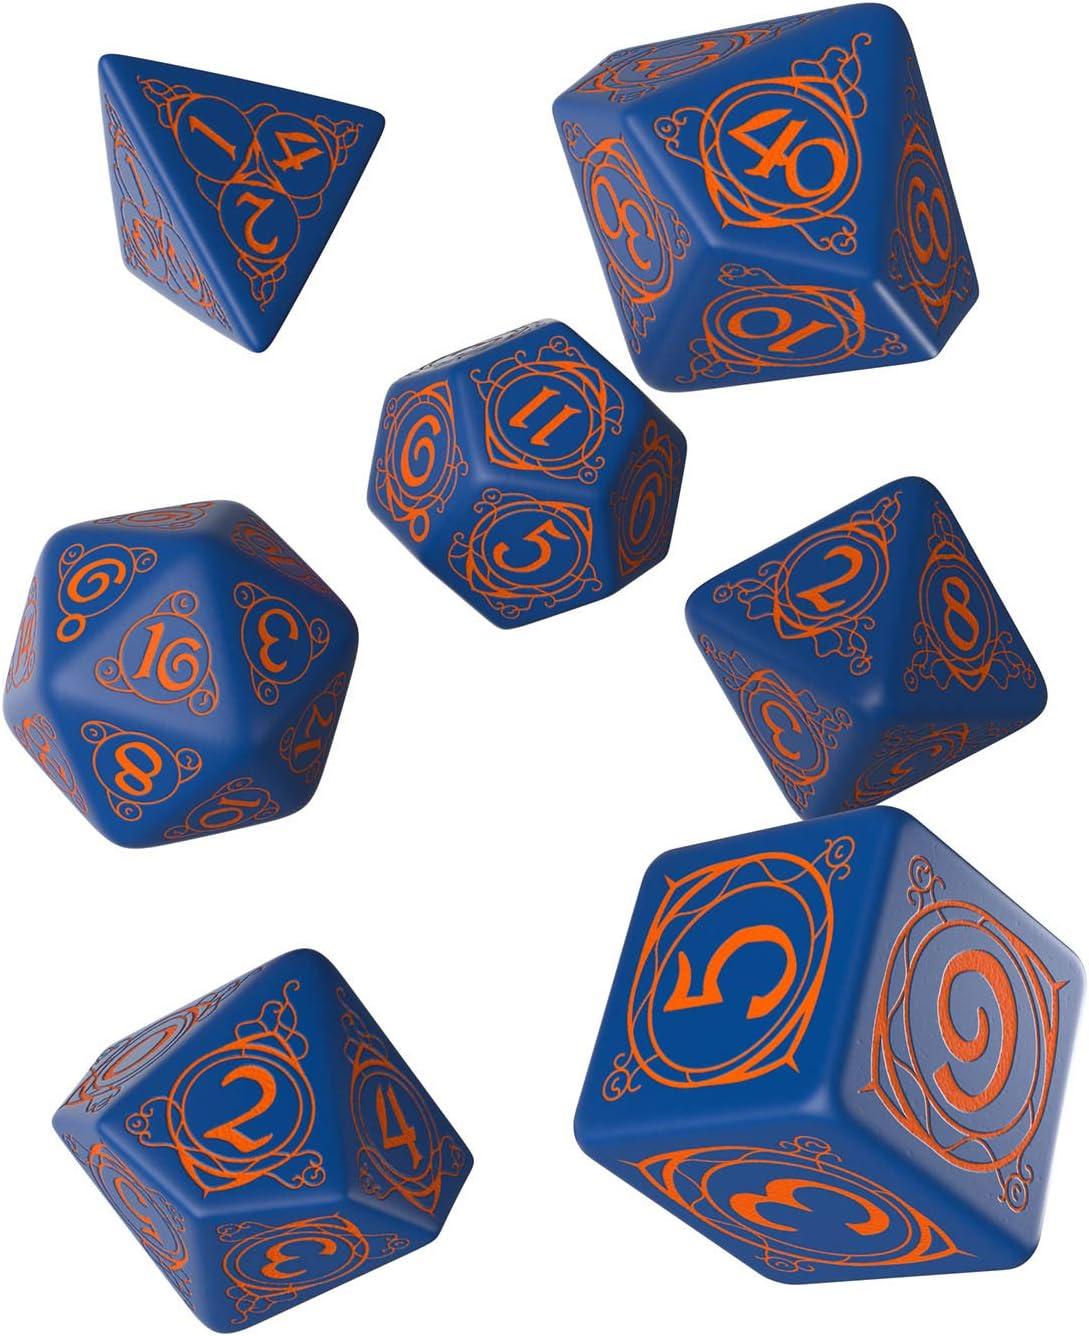 7 Q Workshop Pathfinder Goblin Purple /& Green Dice Set Board Games